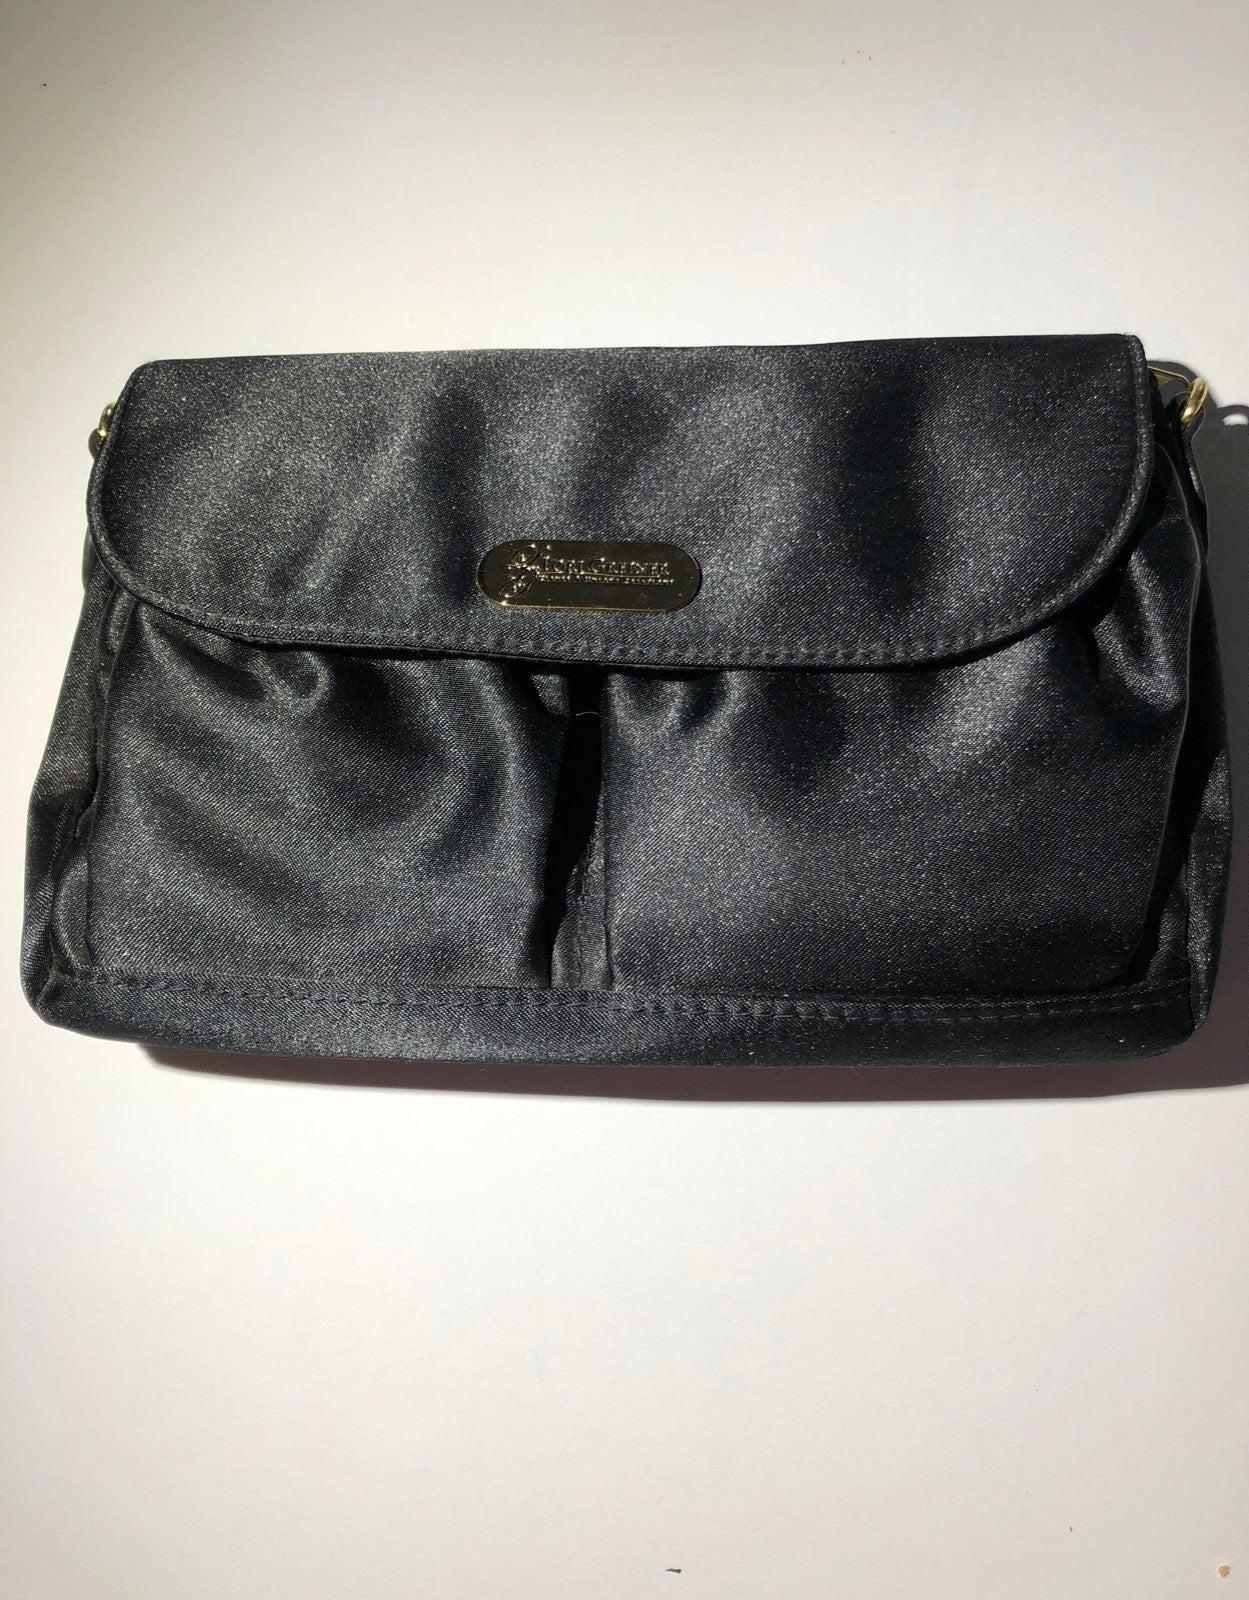 Lori greiner medium-large purse